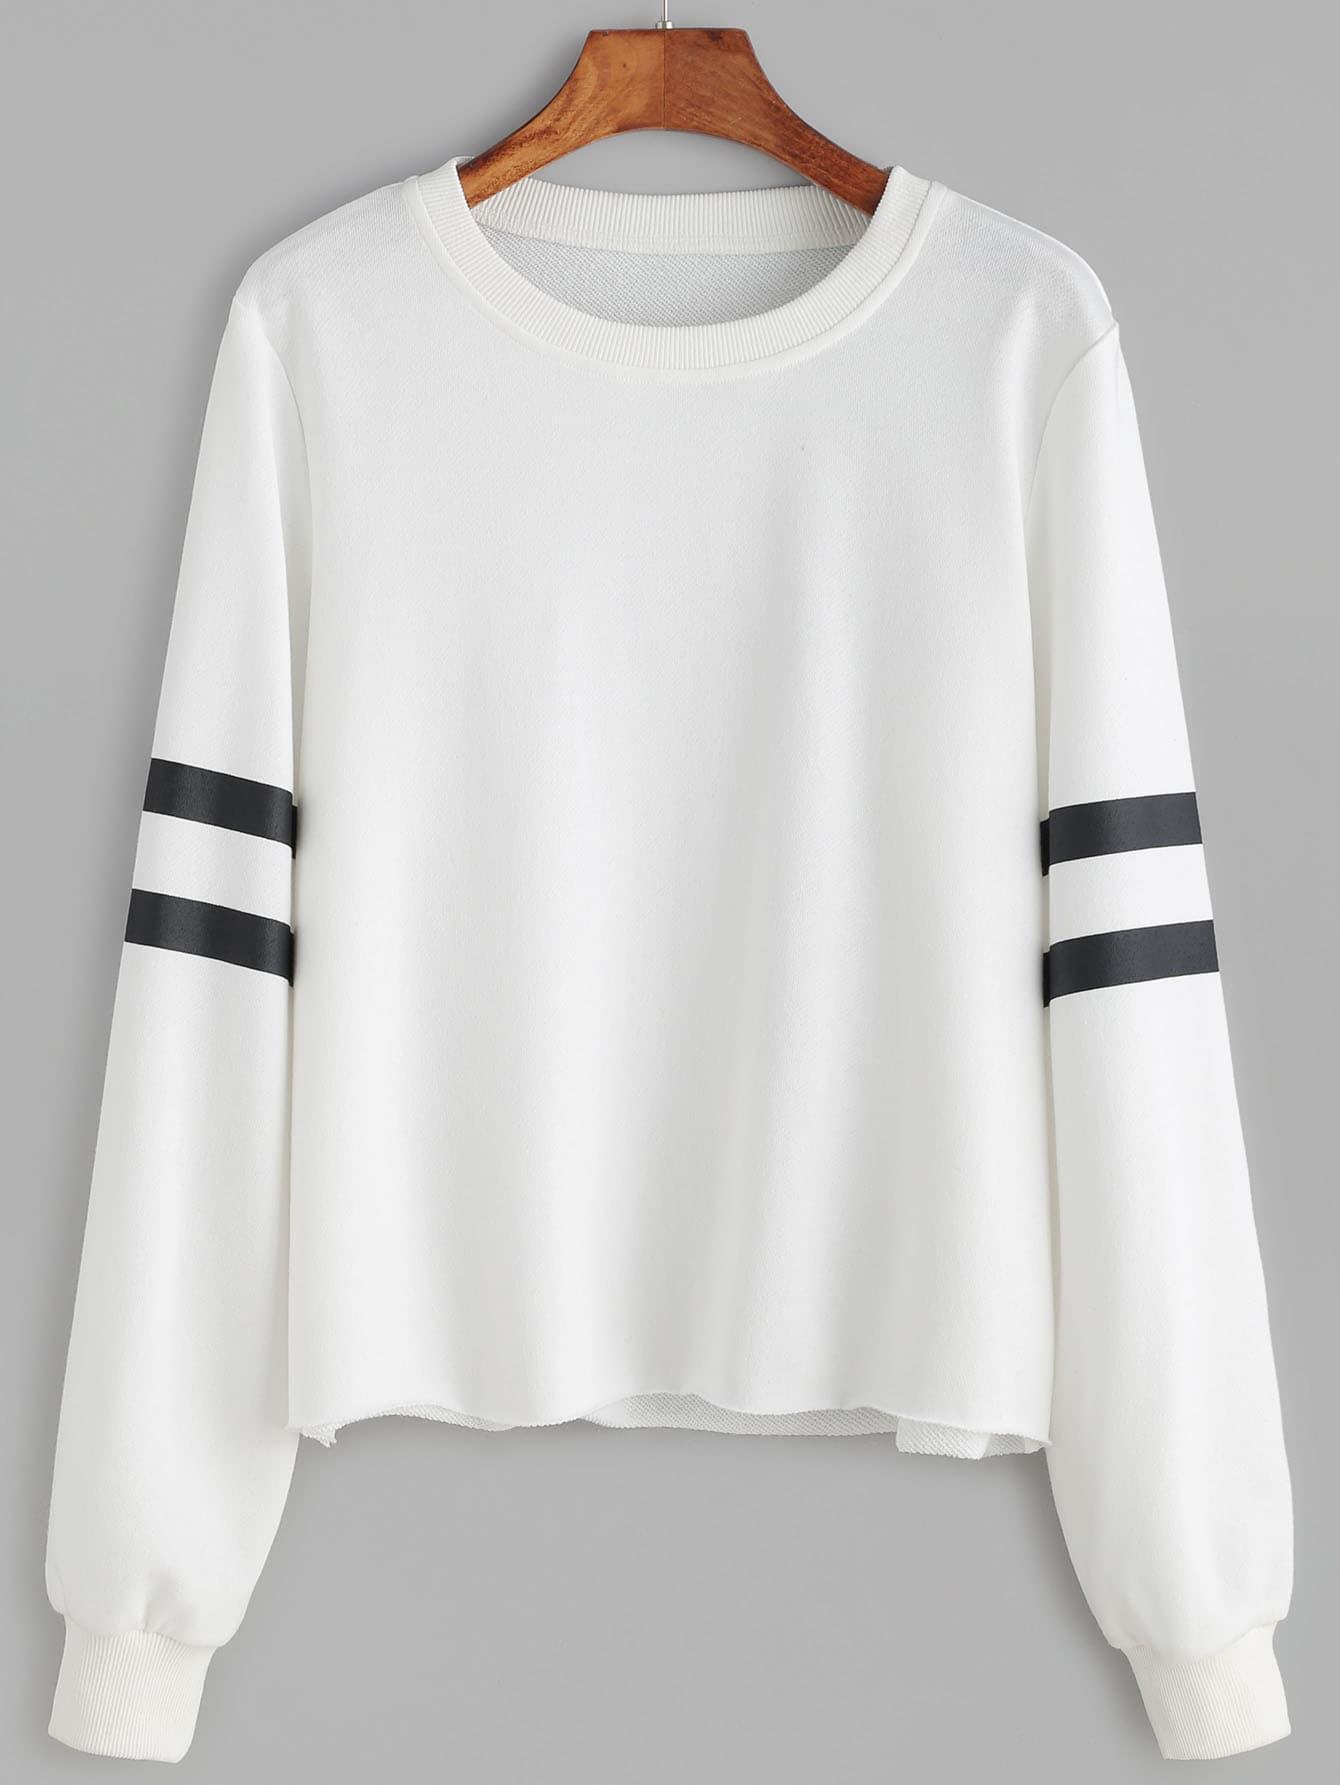 White Striped Sleeve Raw Hem Sweatshirt sweatshirt161101703